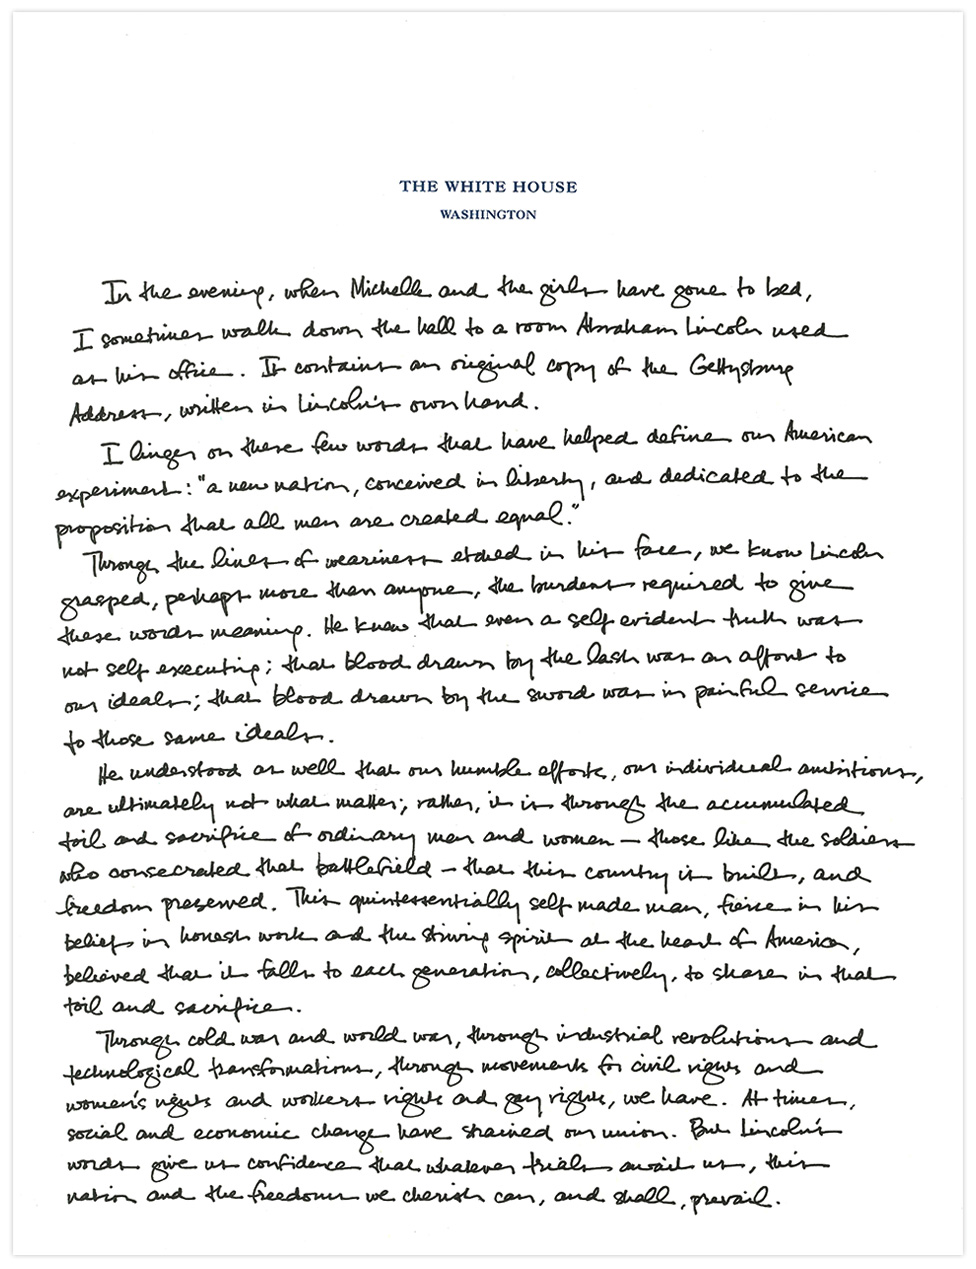 001 Obama Essay Potus Gettysburg Web 2013 Marvelous President Research Paper Barack Pdf Michelle Full